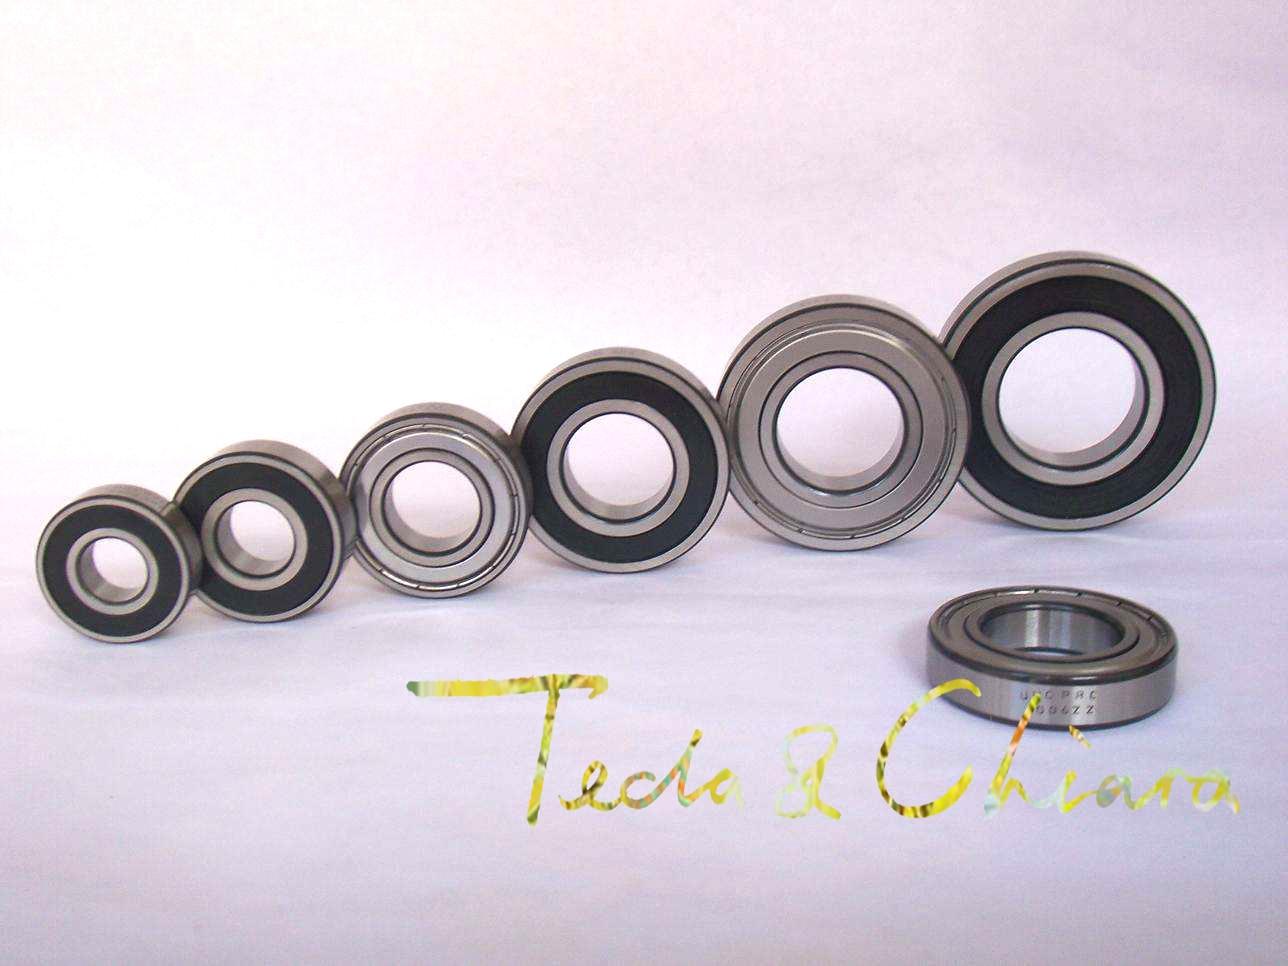 6004 6004ZZ 6004RS 6004-2Z 6004Z 6004-2RS ZZ RS RZ 2RZ Deep Groove Ball Bearings 20 x 42 x 12mm High Quality evolis avansia duplex expert smart & contactless av1h0vvcbd page 4